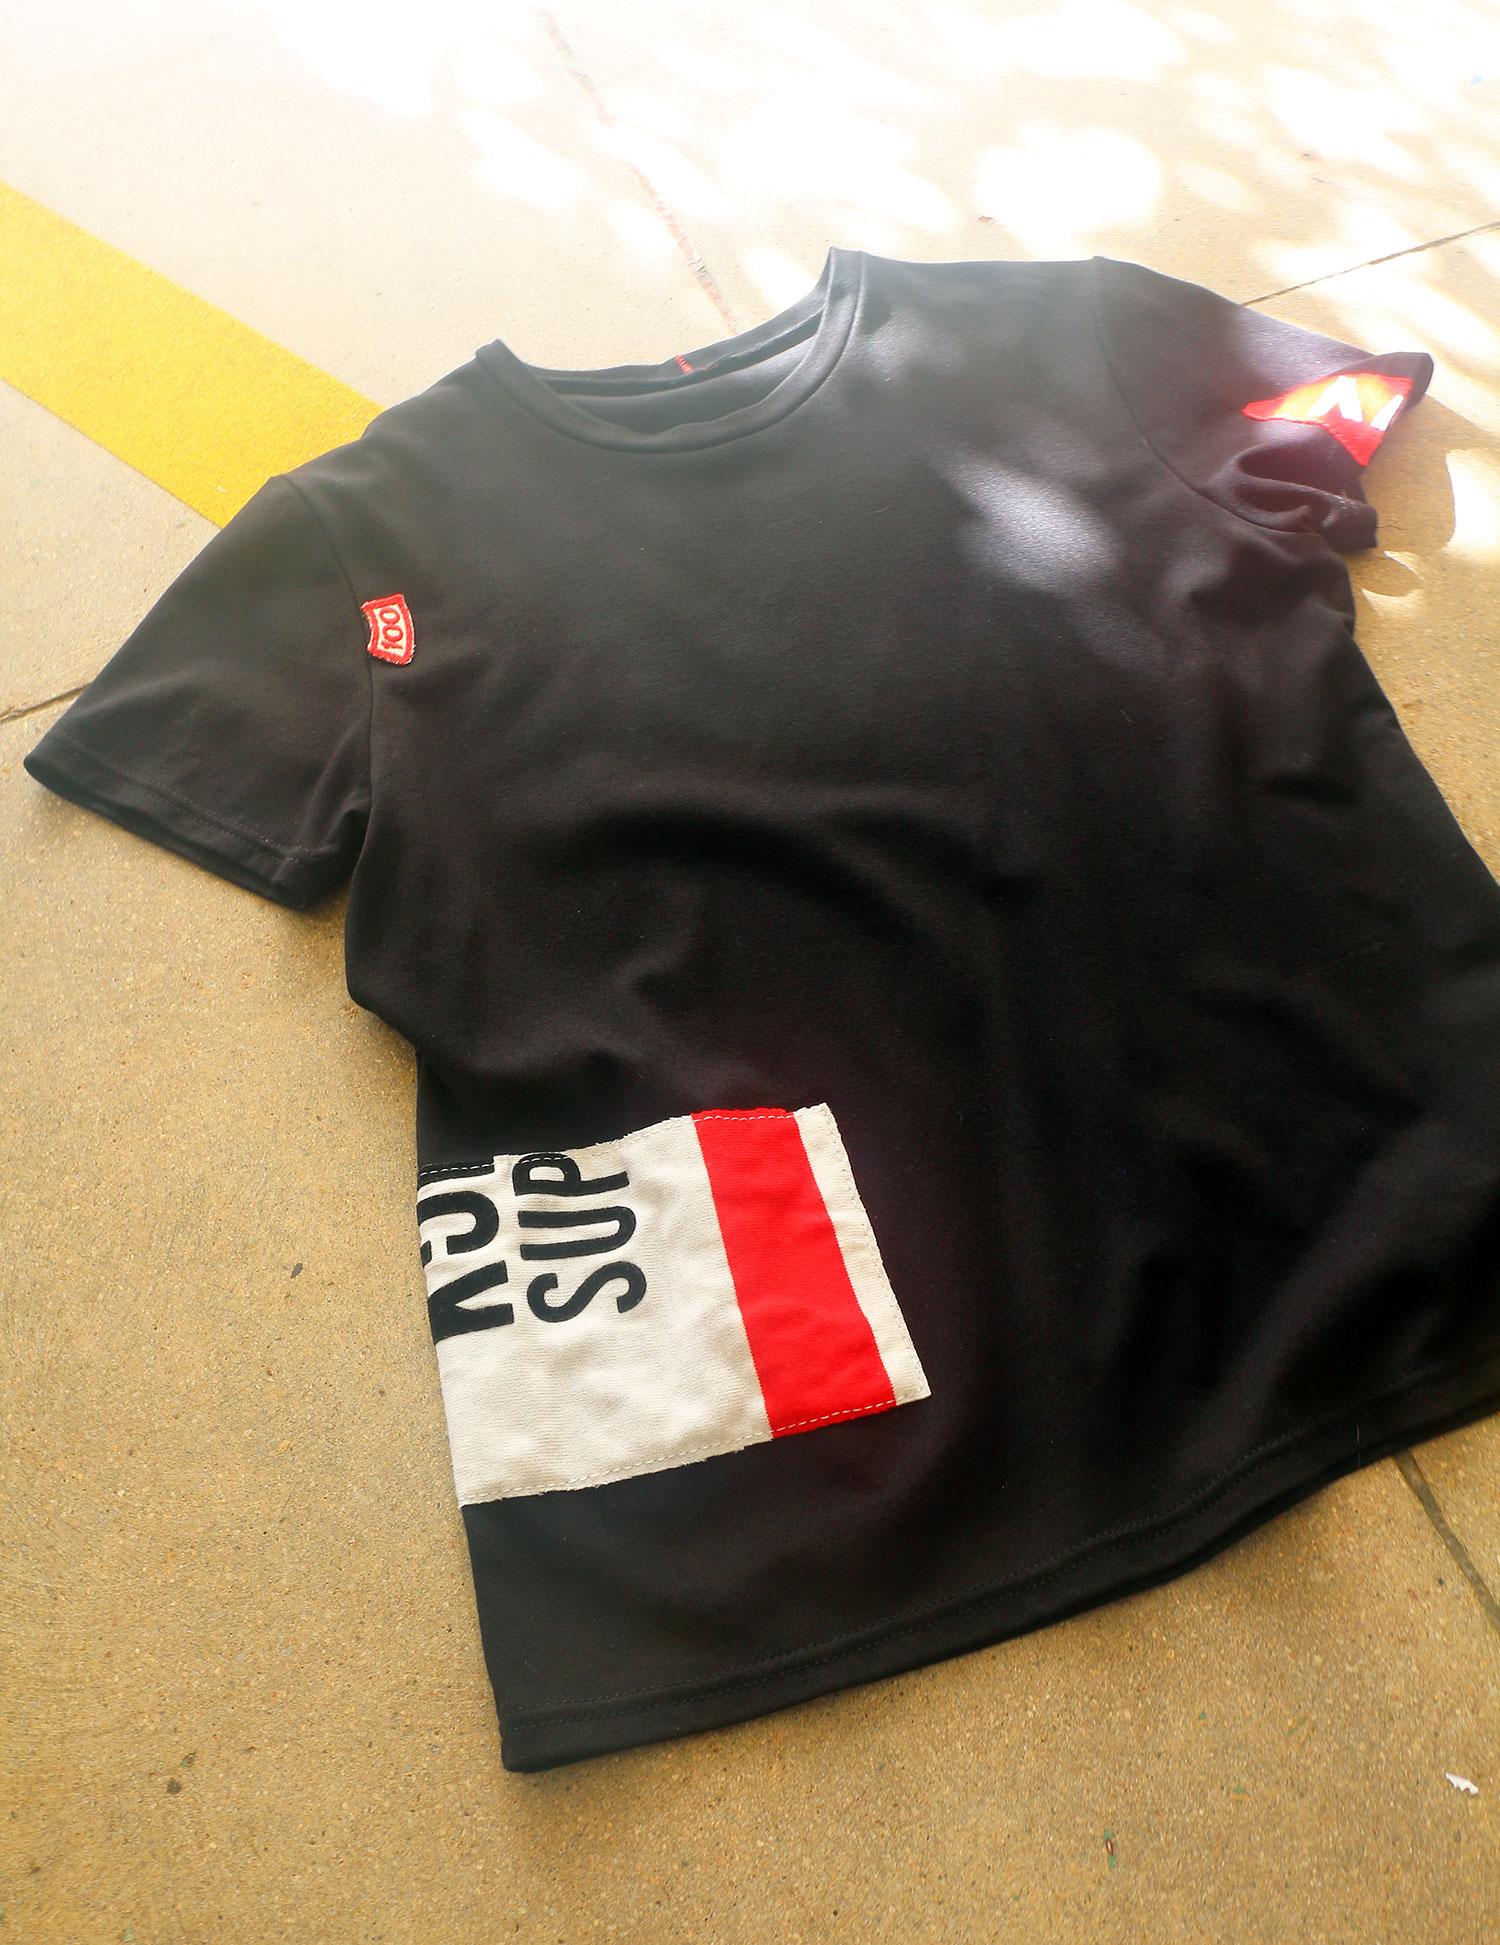 ron-miriello-grafico-san-diego-officina-eroica-vintage-cycling-jersey-maglia-bici-branding-15.jpg